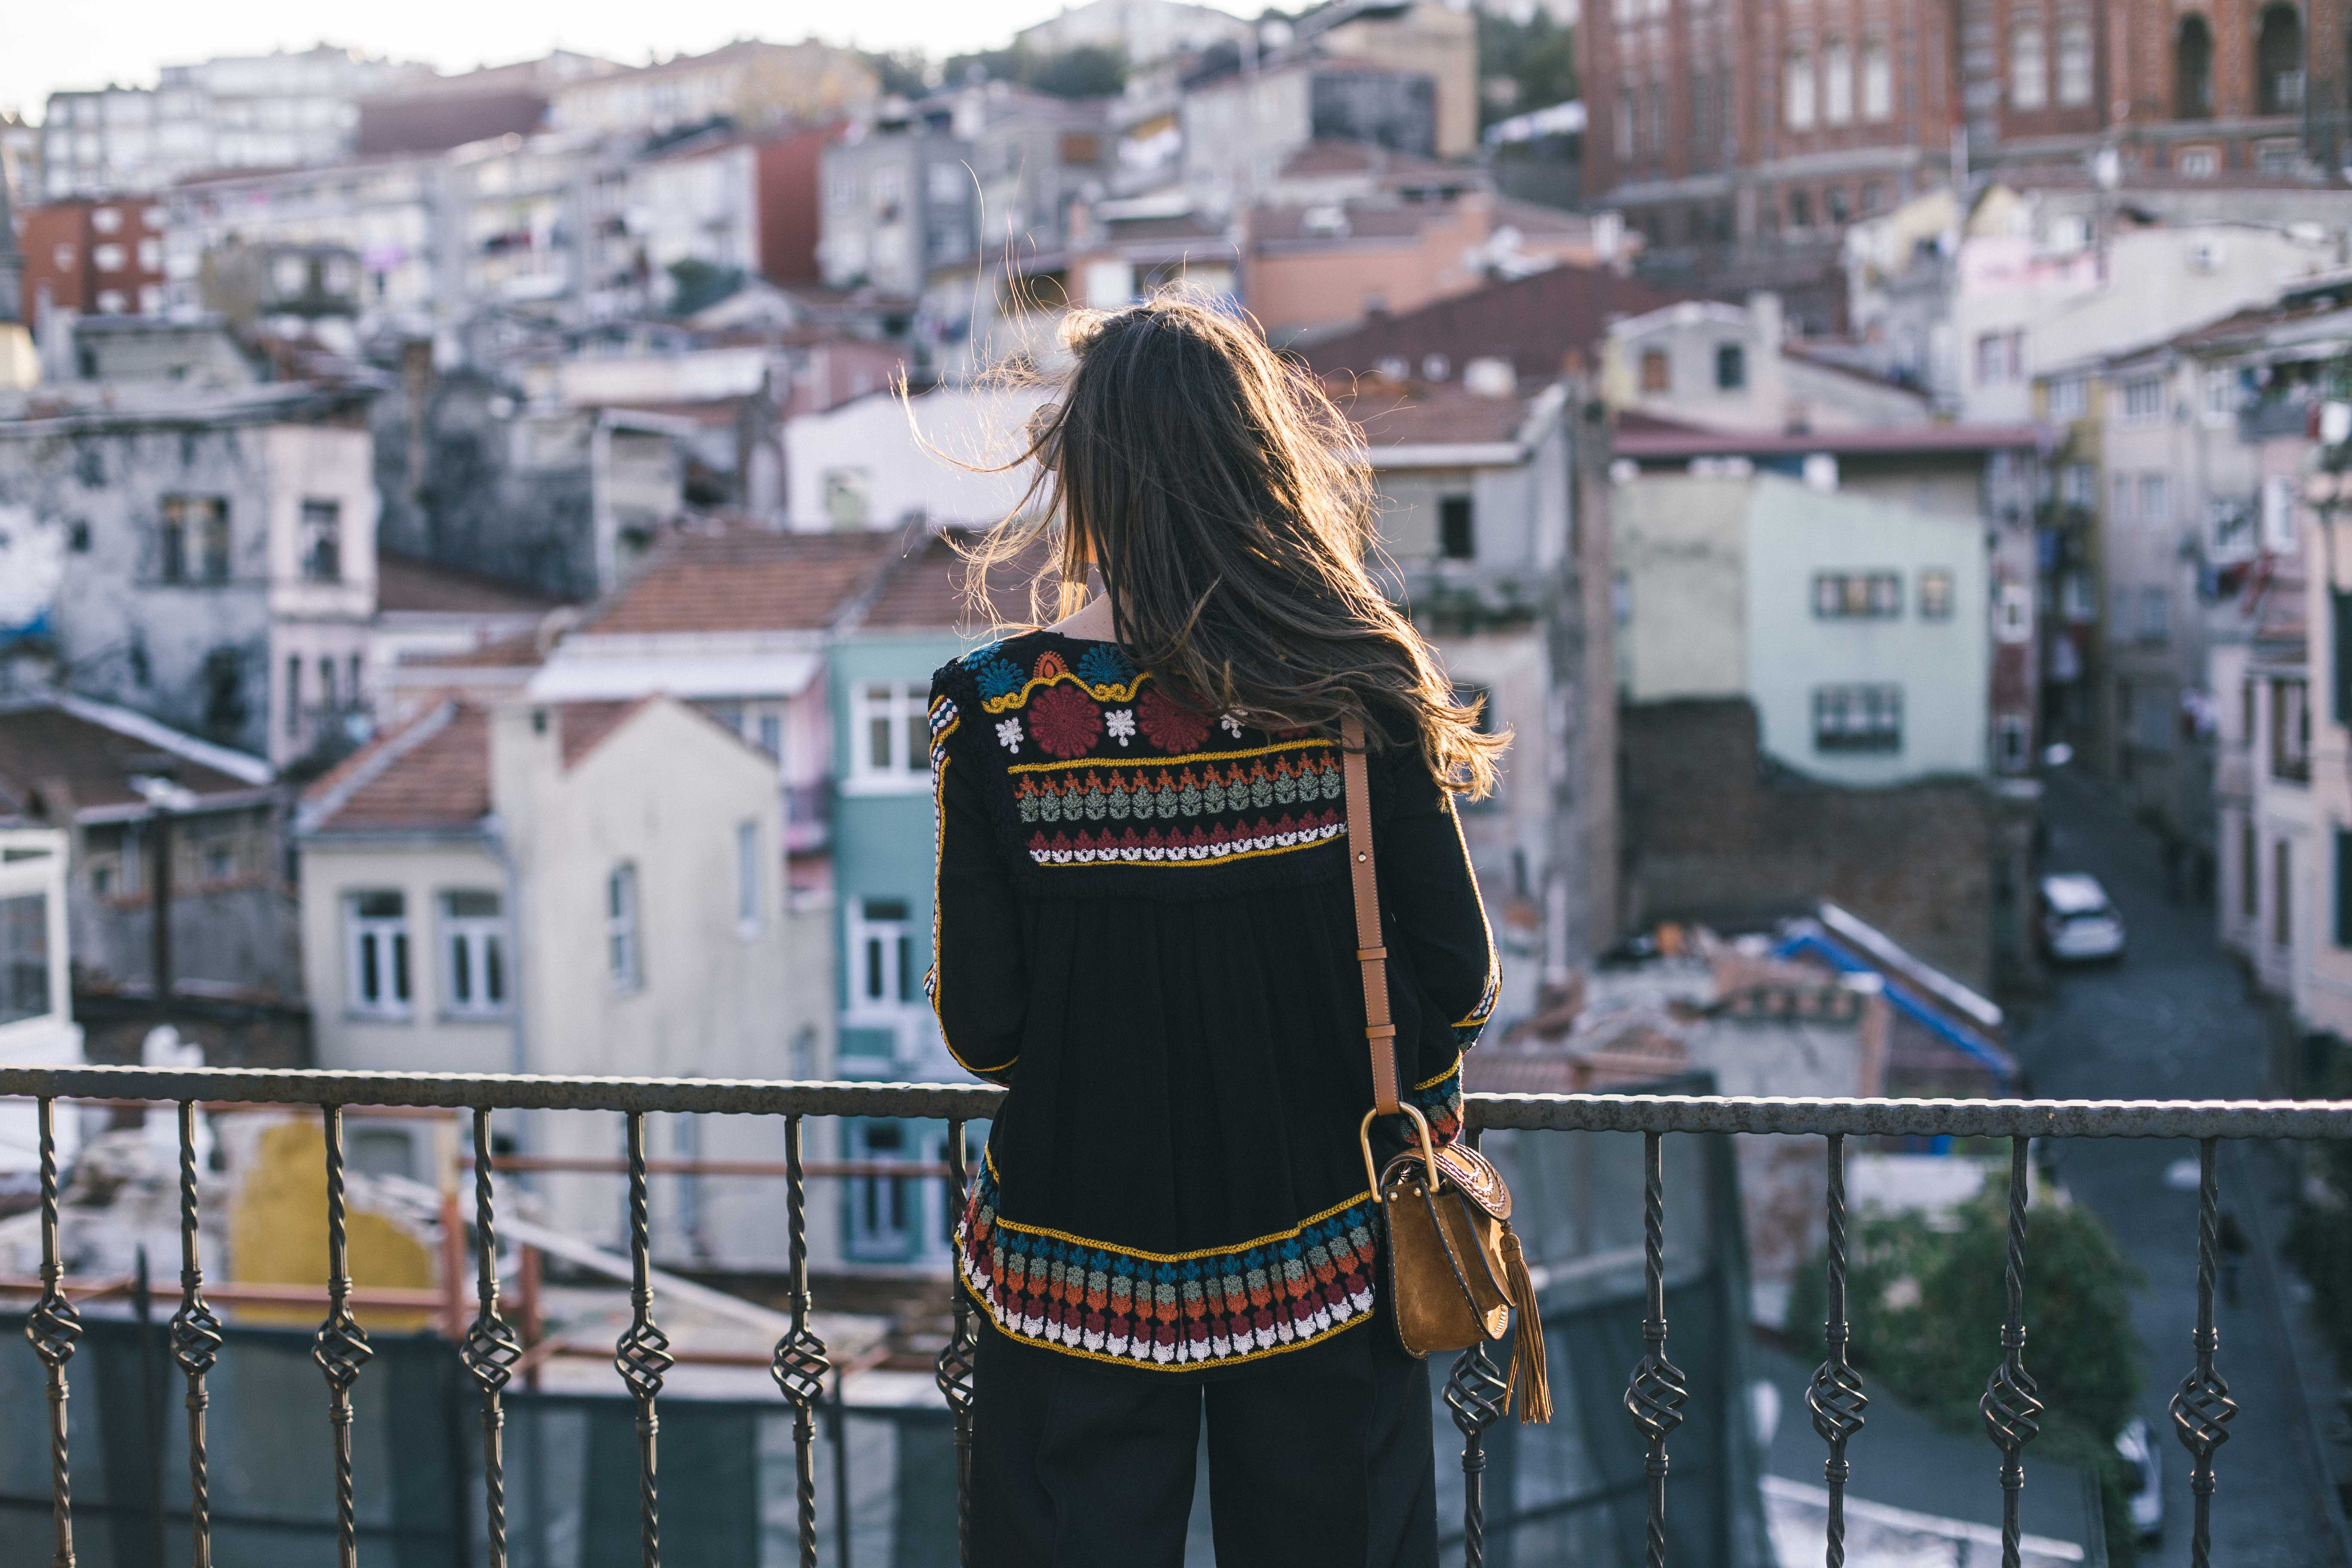 billur saatci, offnegiysem, turkish style blogger, street style, fashion, ootd, blogger, istanbul, balat, zara, acne, miu miu, sunglass hut, topshop, chloe, philip lim,